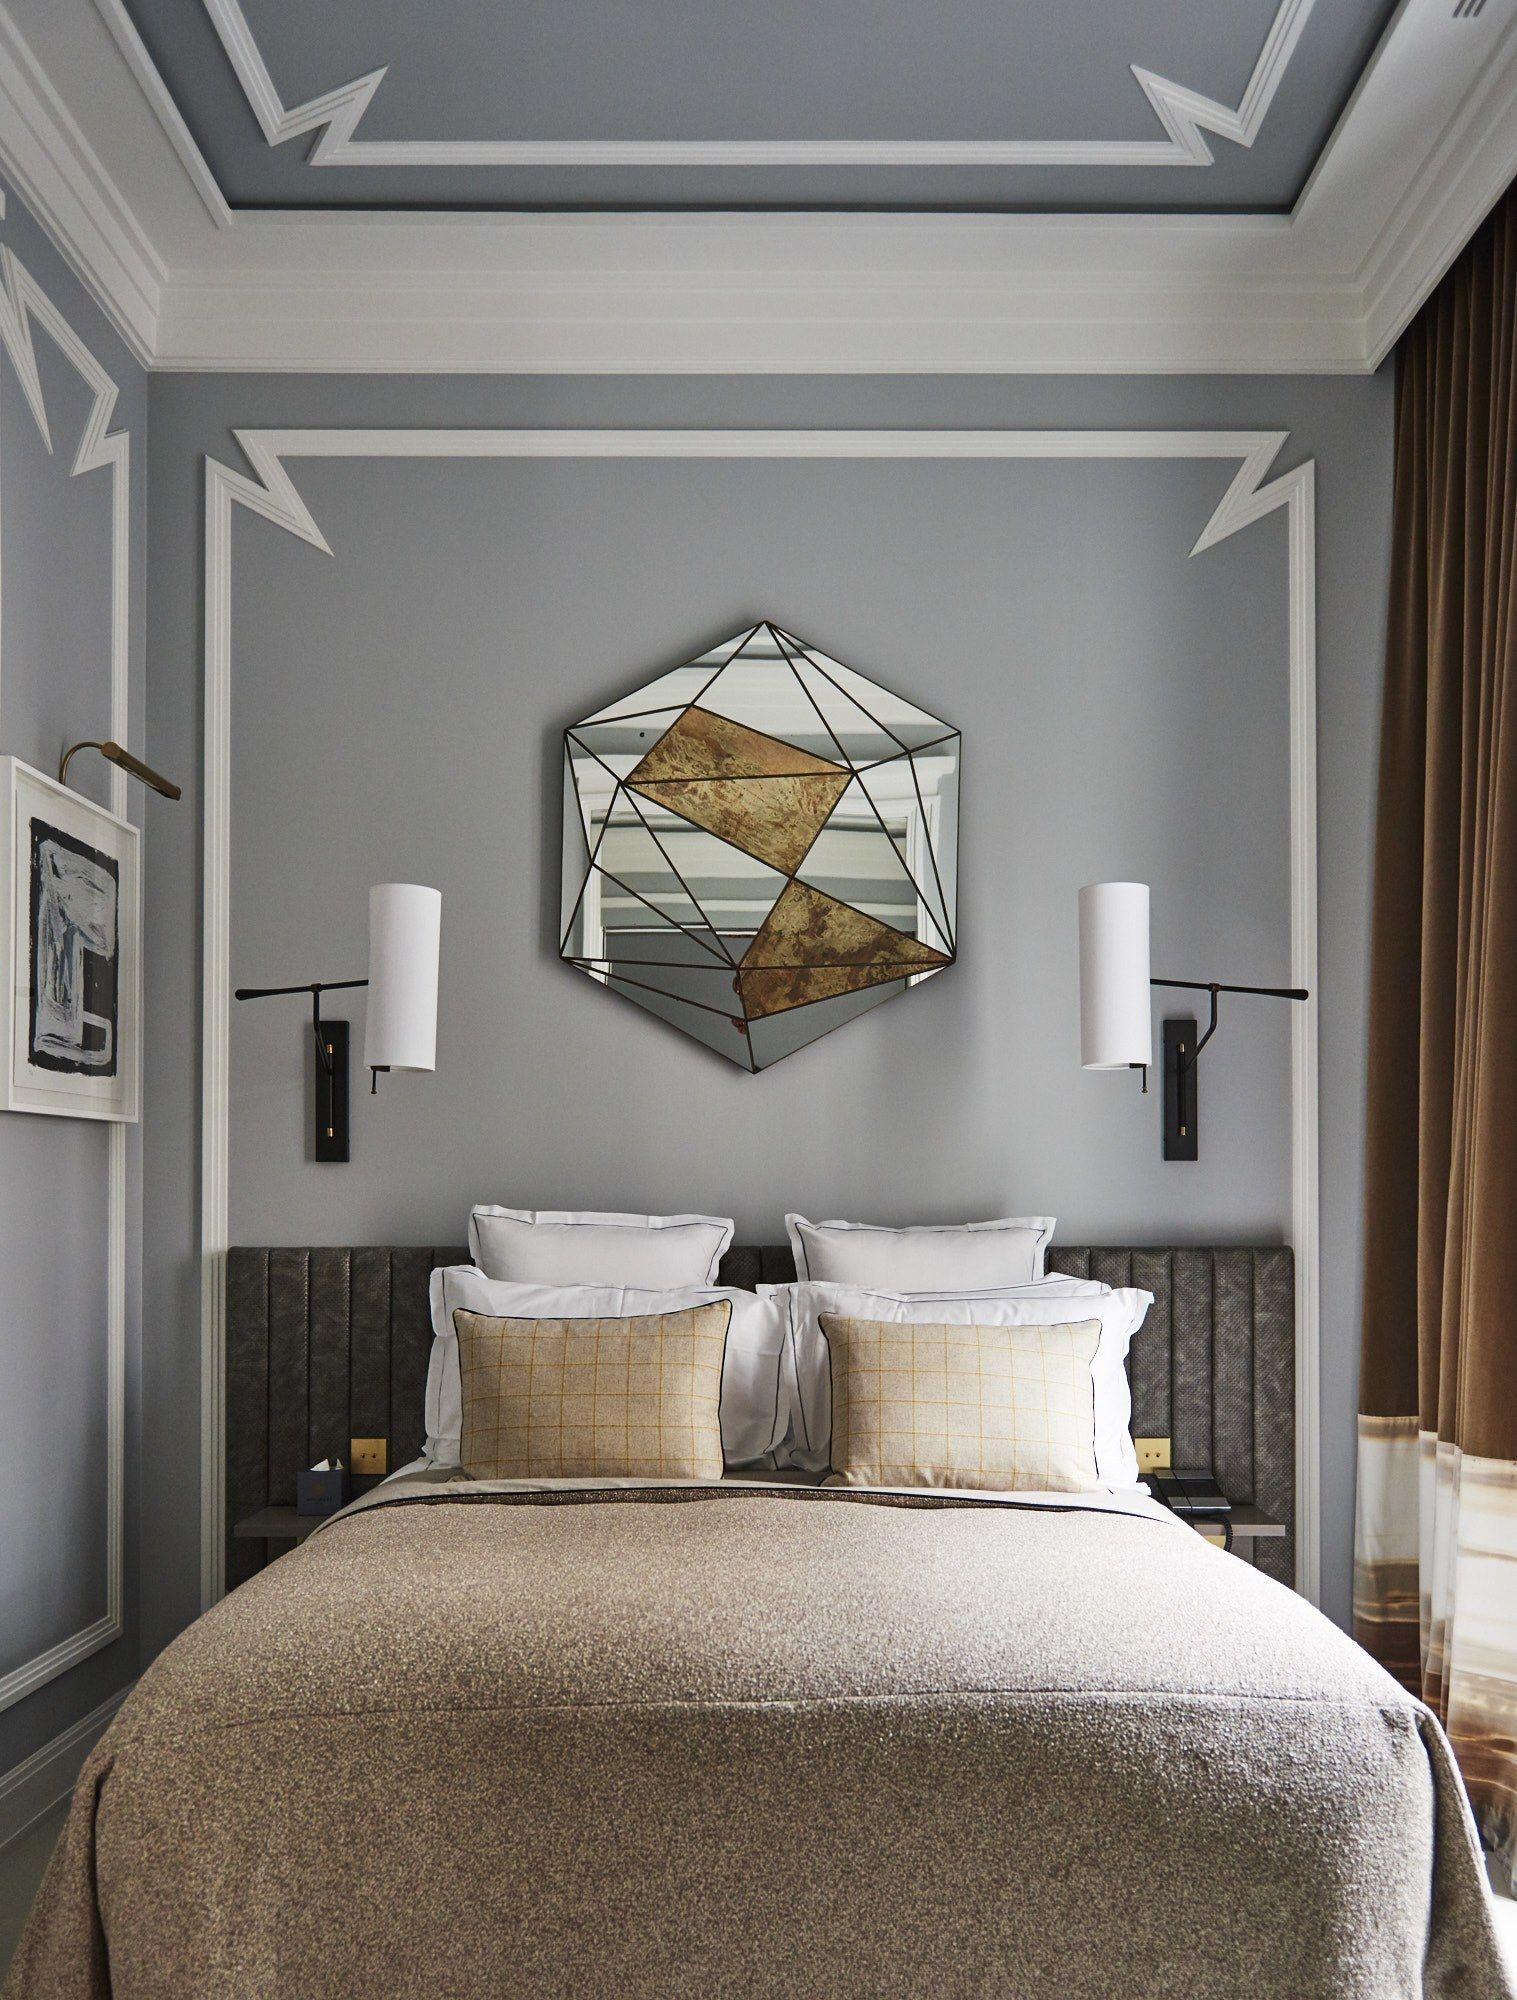 Small Hotel Room: Nolinski Paris, Paris, France - Hotel Review